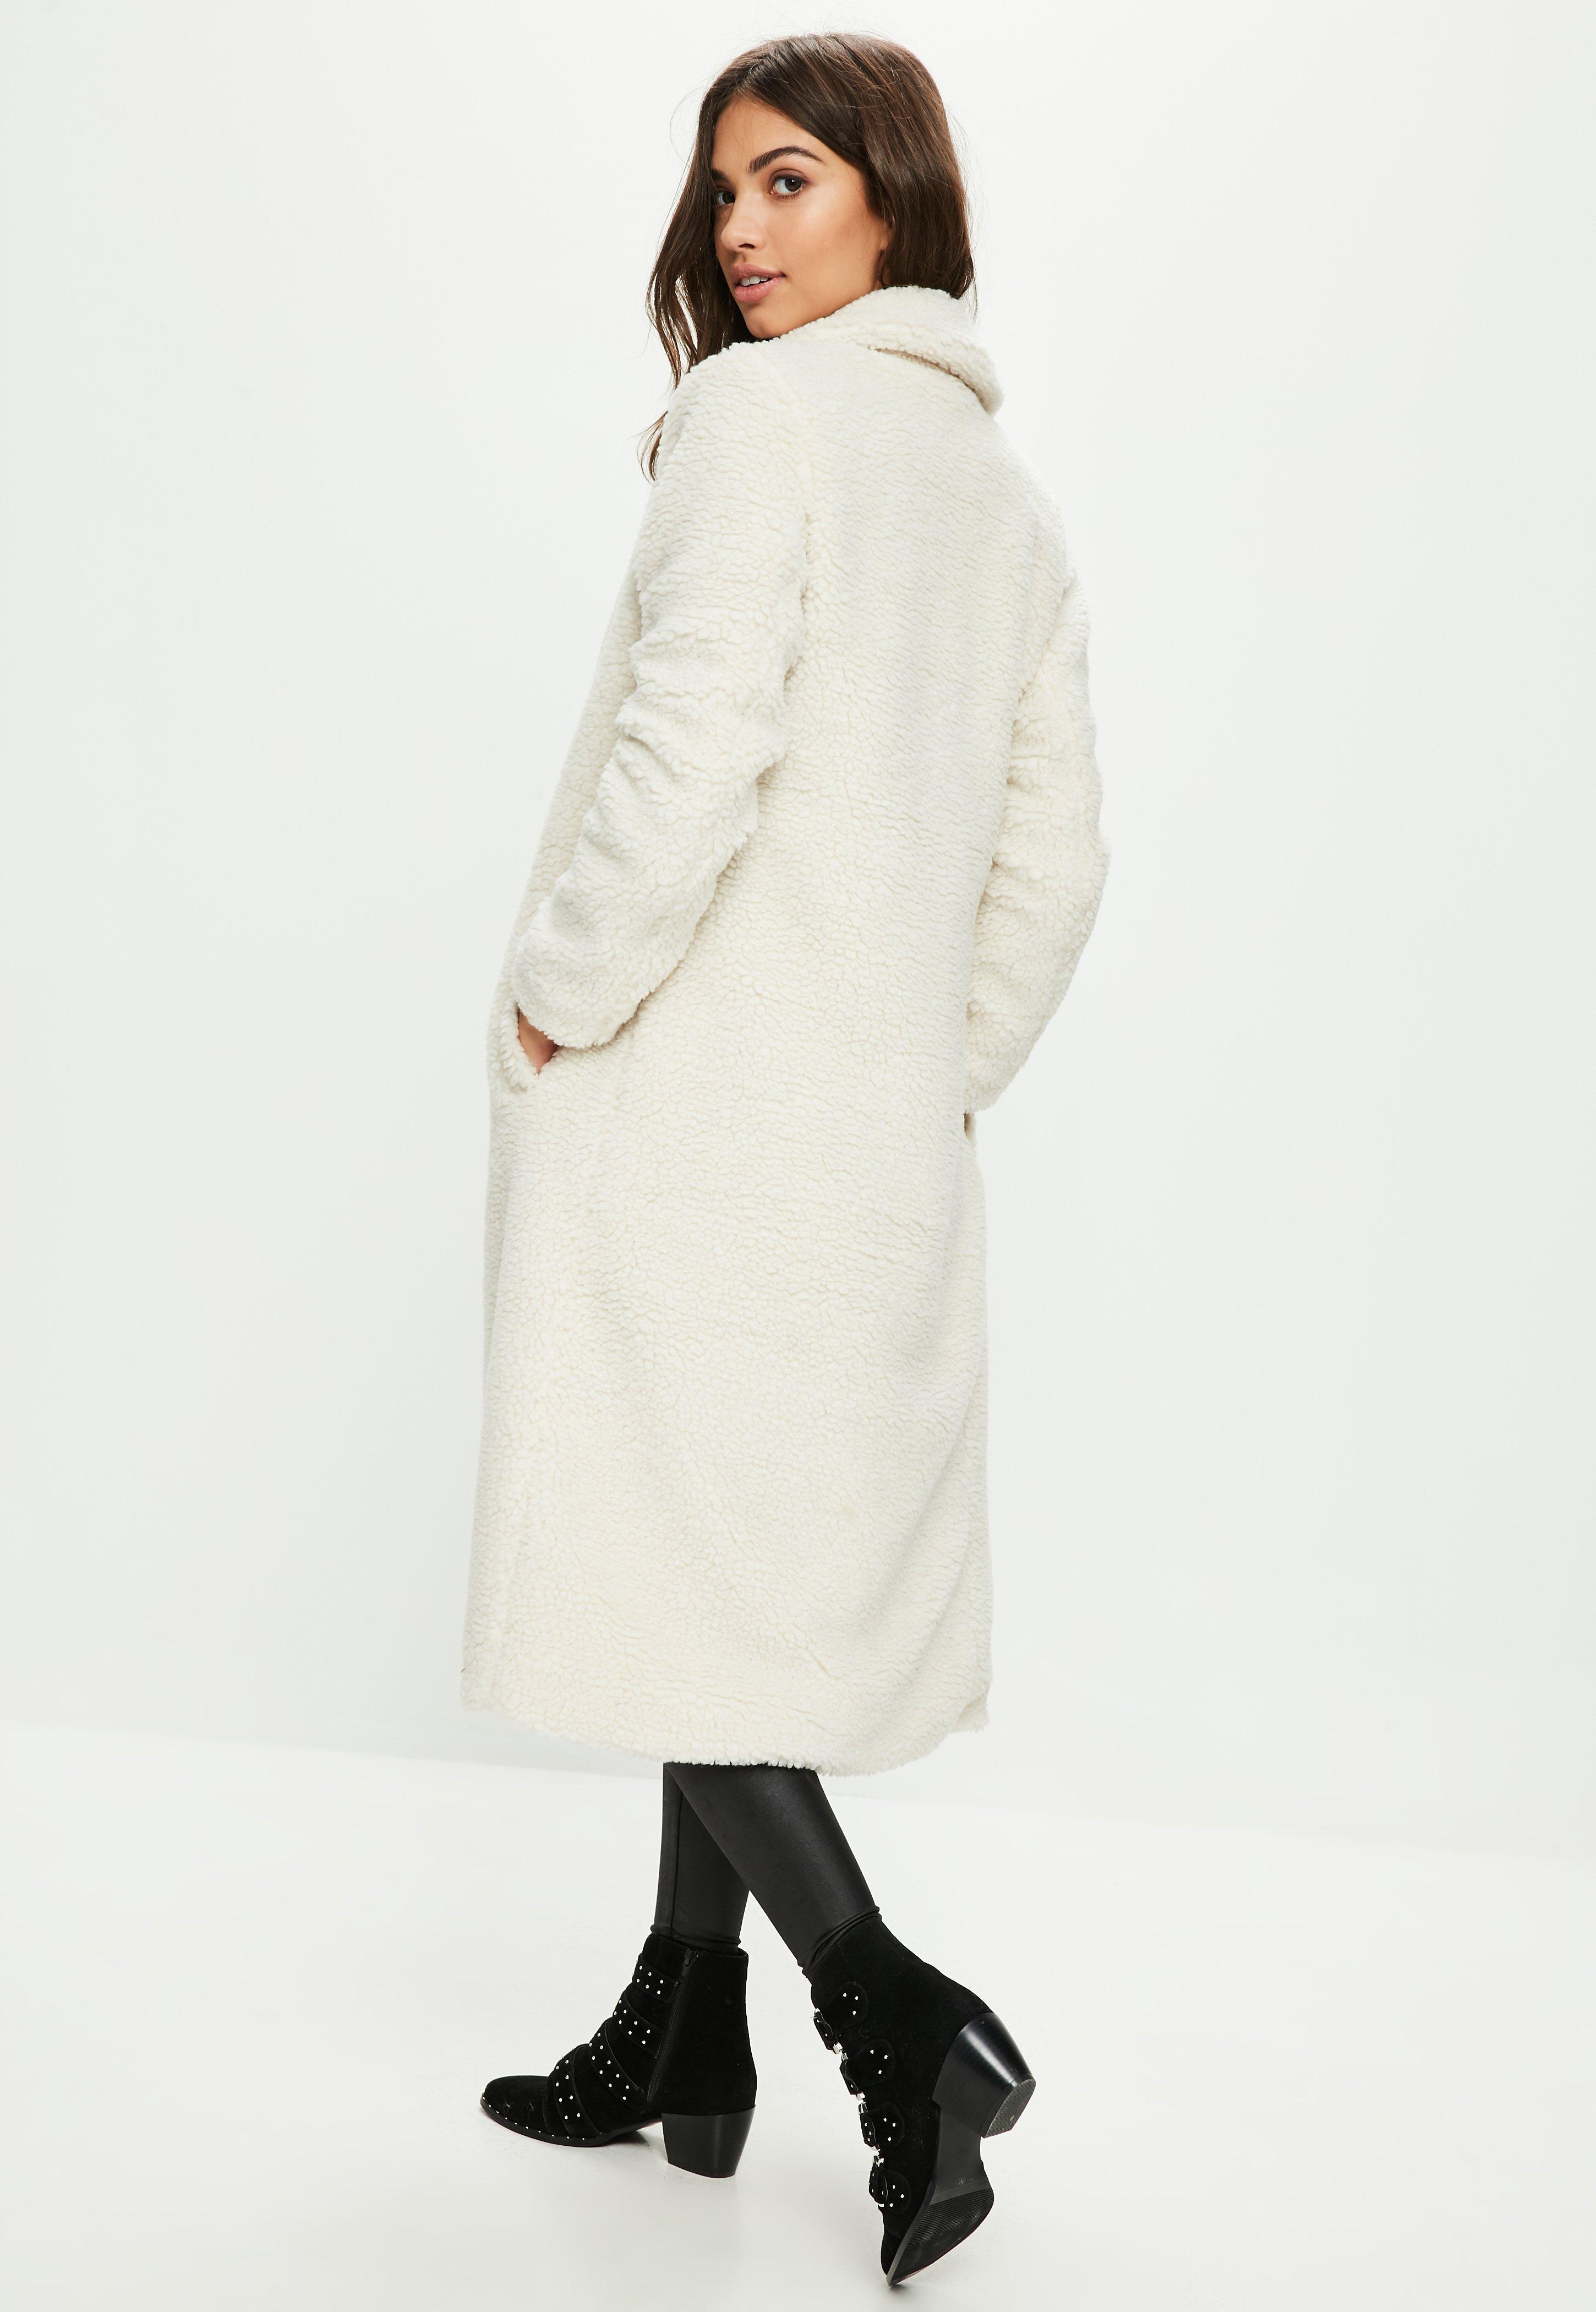 88b4b69c6 Lyst - Missguided Cream Borg Teddy Coat in Natural